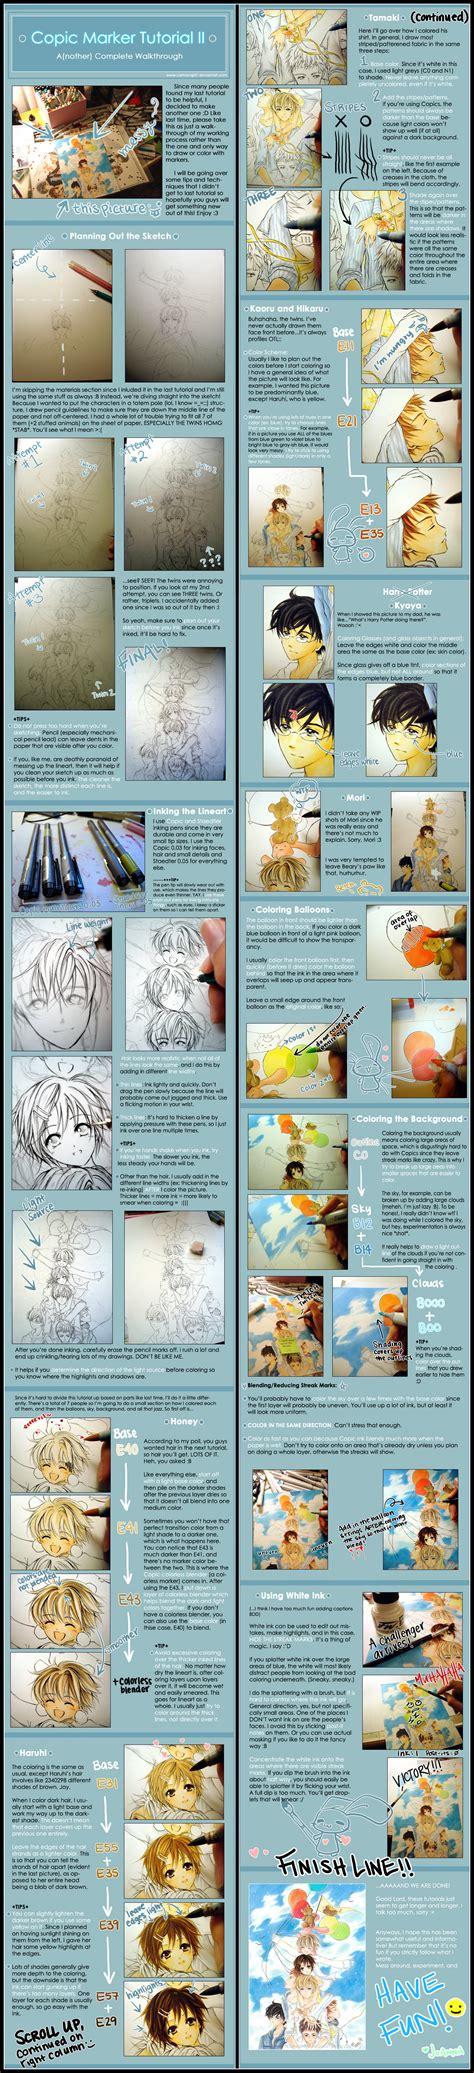 www tutorial copic marker tutorial ii by cartoongirl7 on deviantart